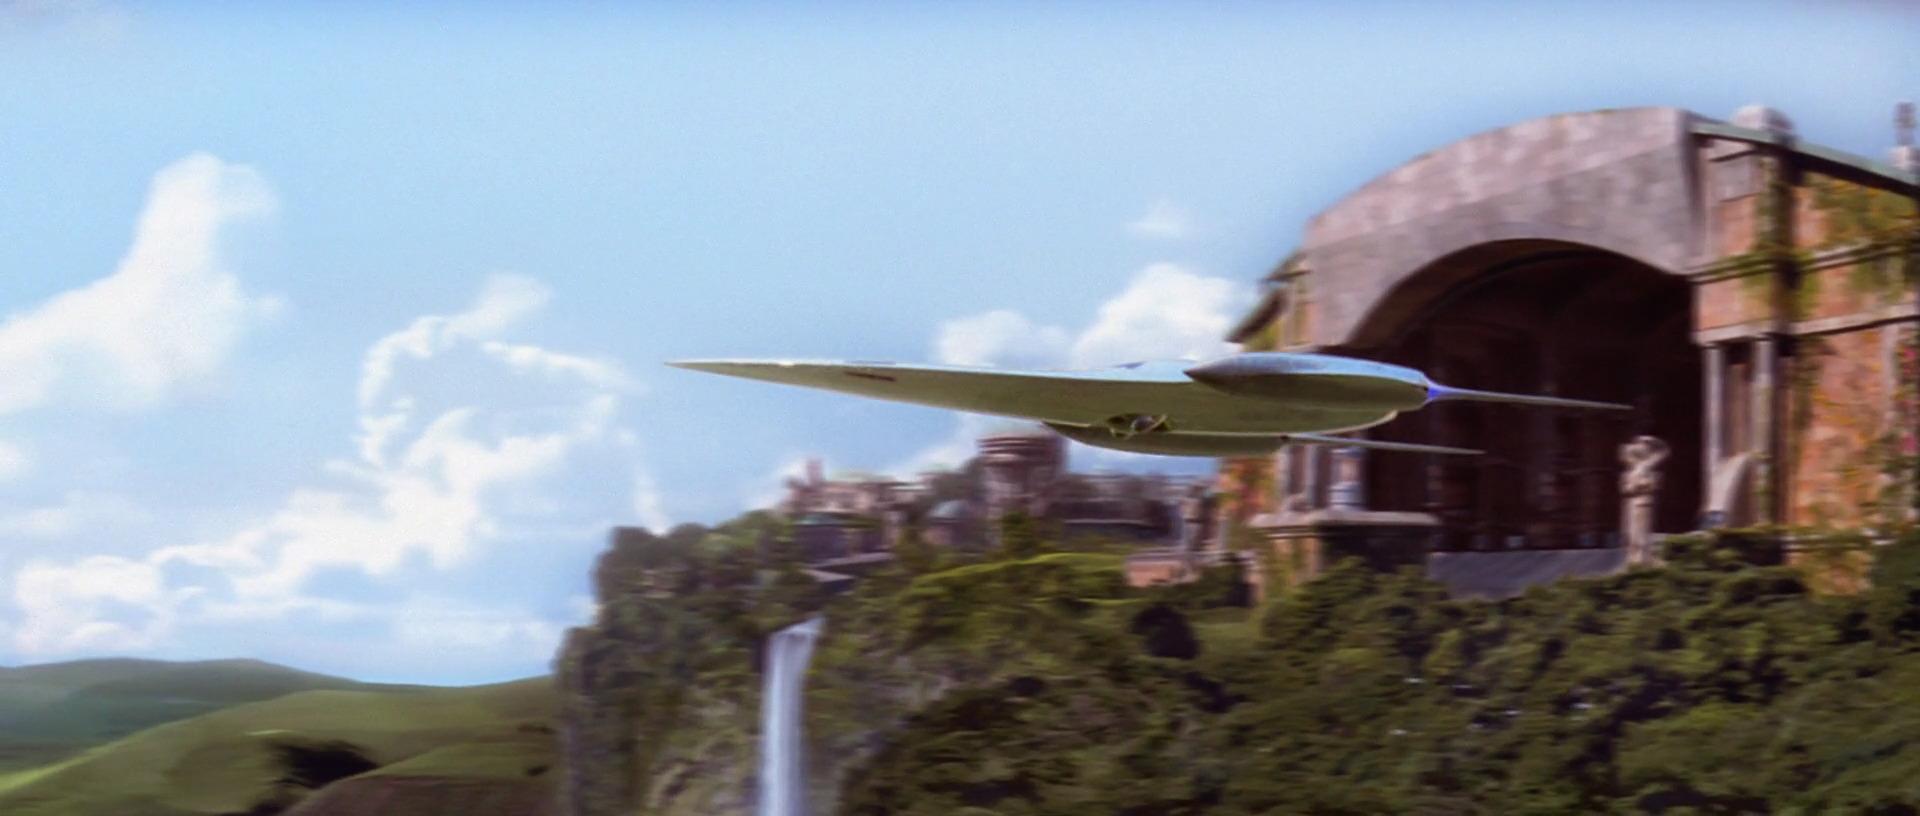 starwars1-movie-screencaps.com-2815